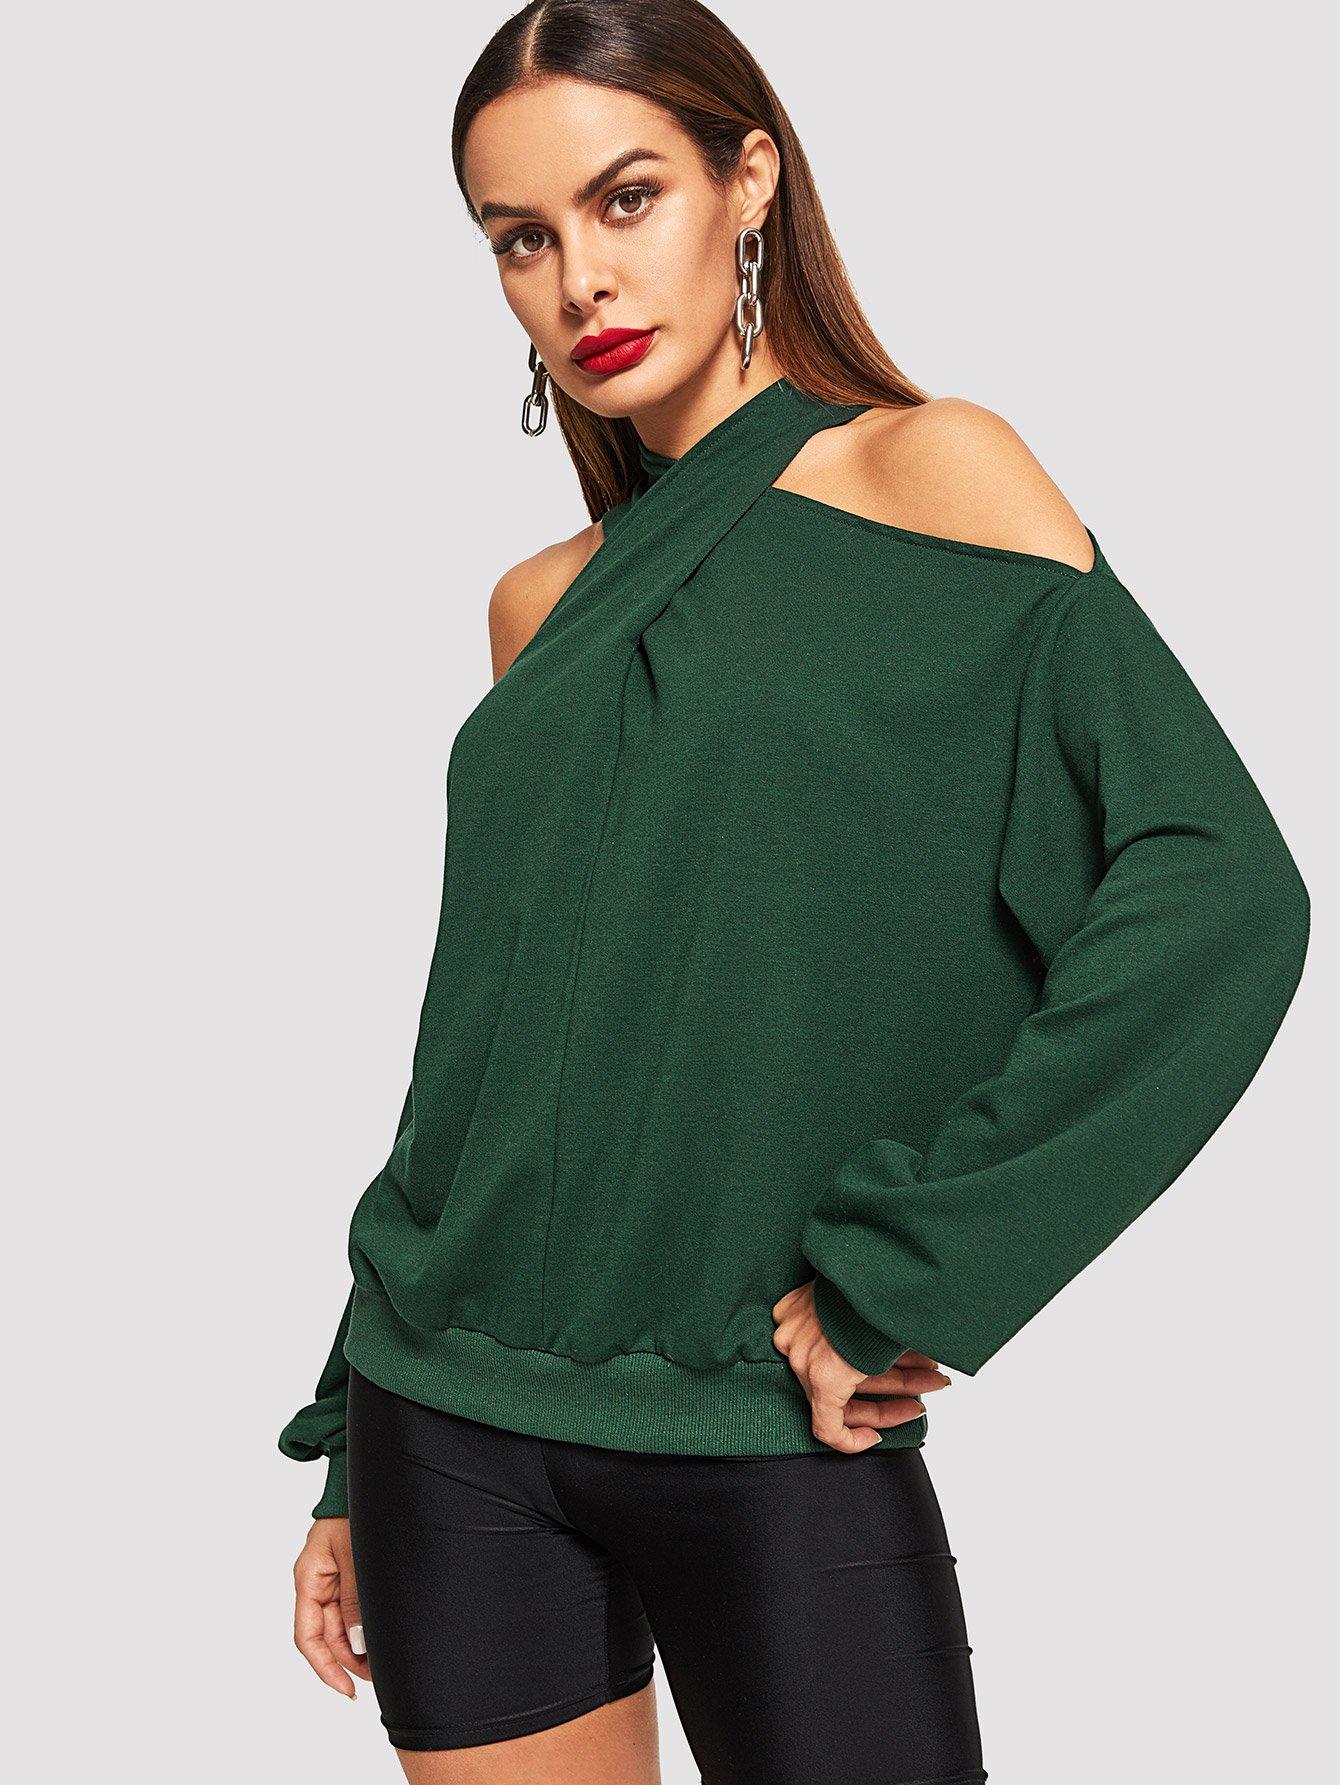 Фото - Крест накрест твердый холтер пуловер от SheIn зеленого цвета